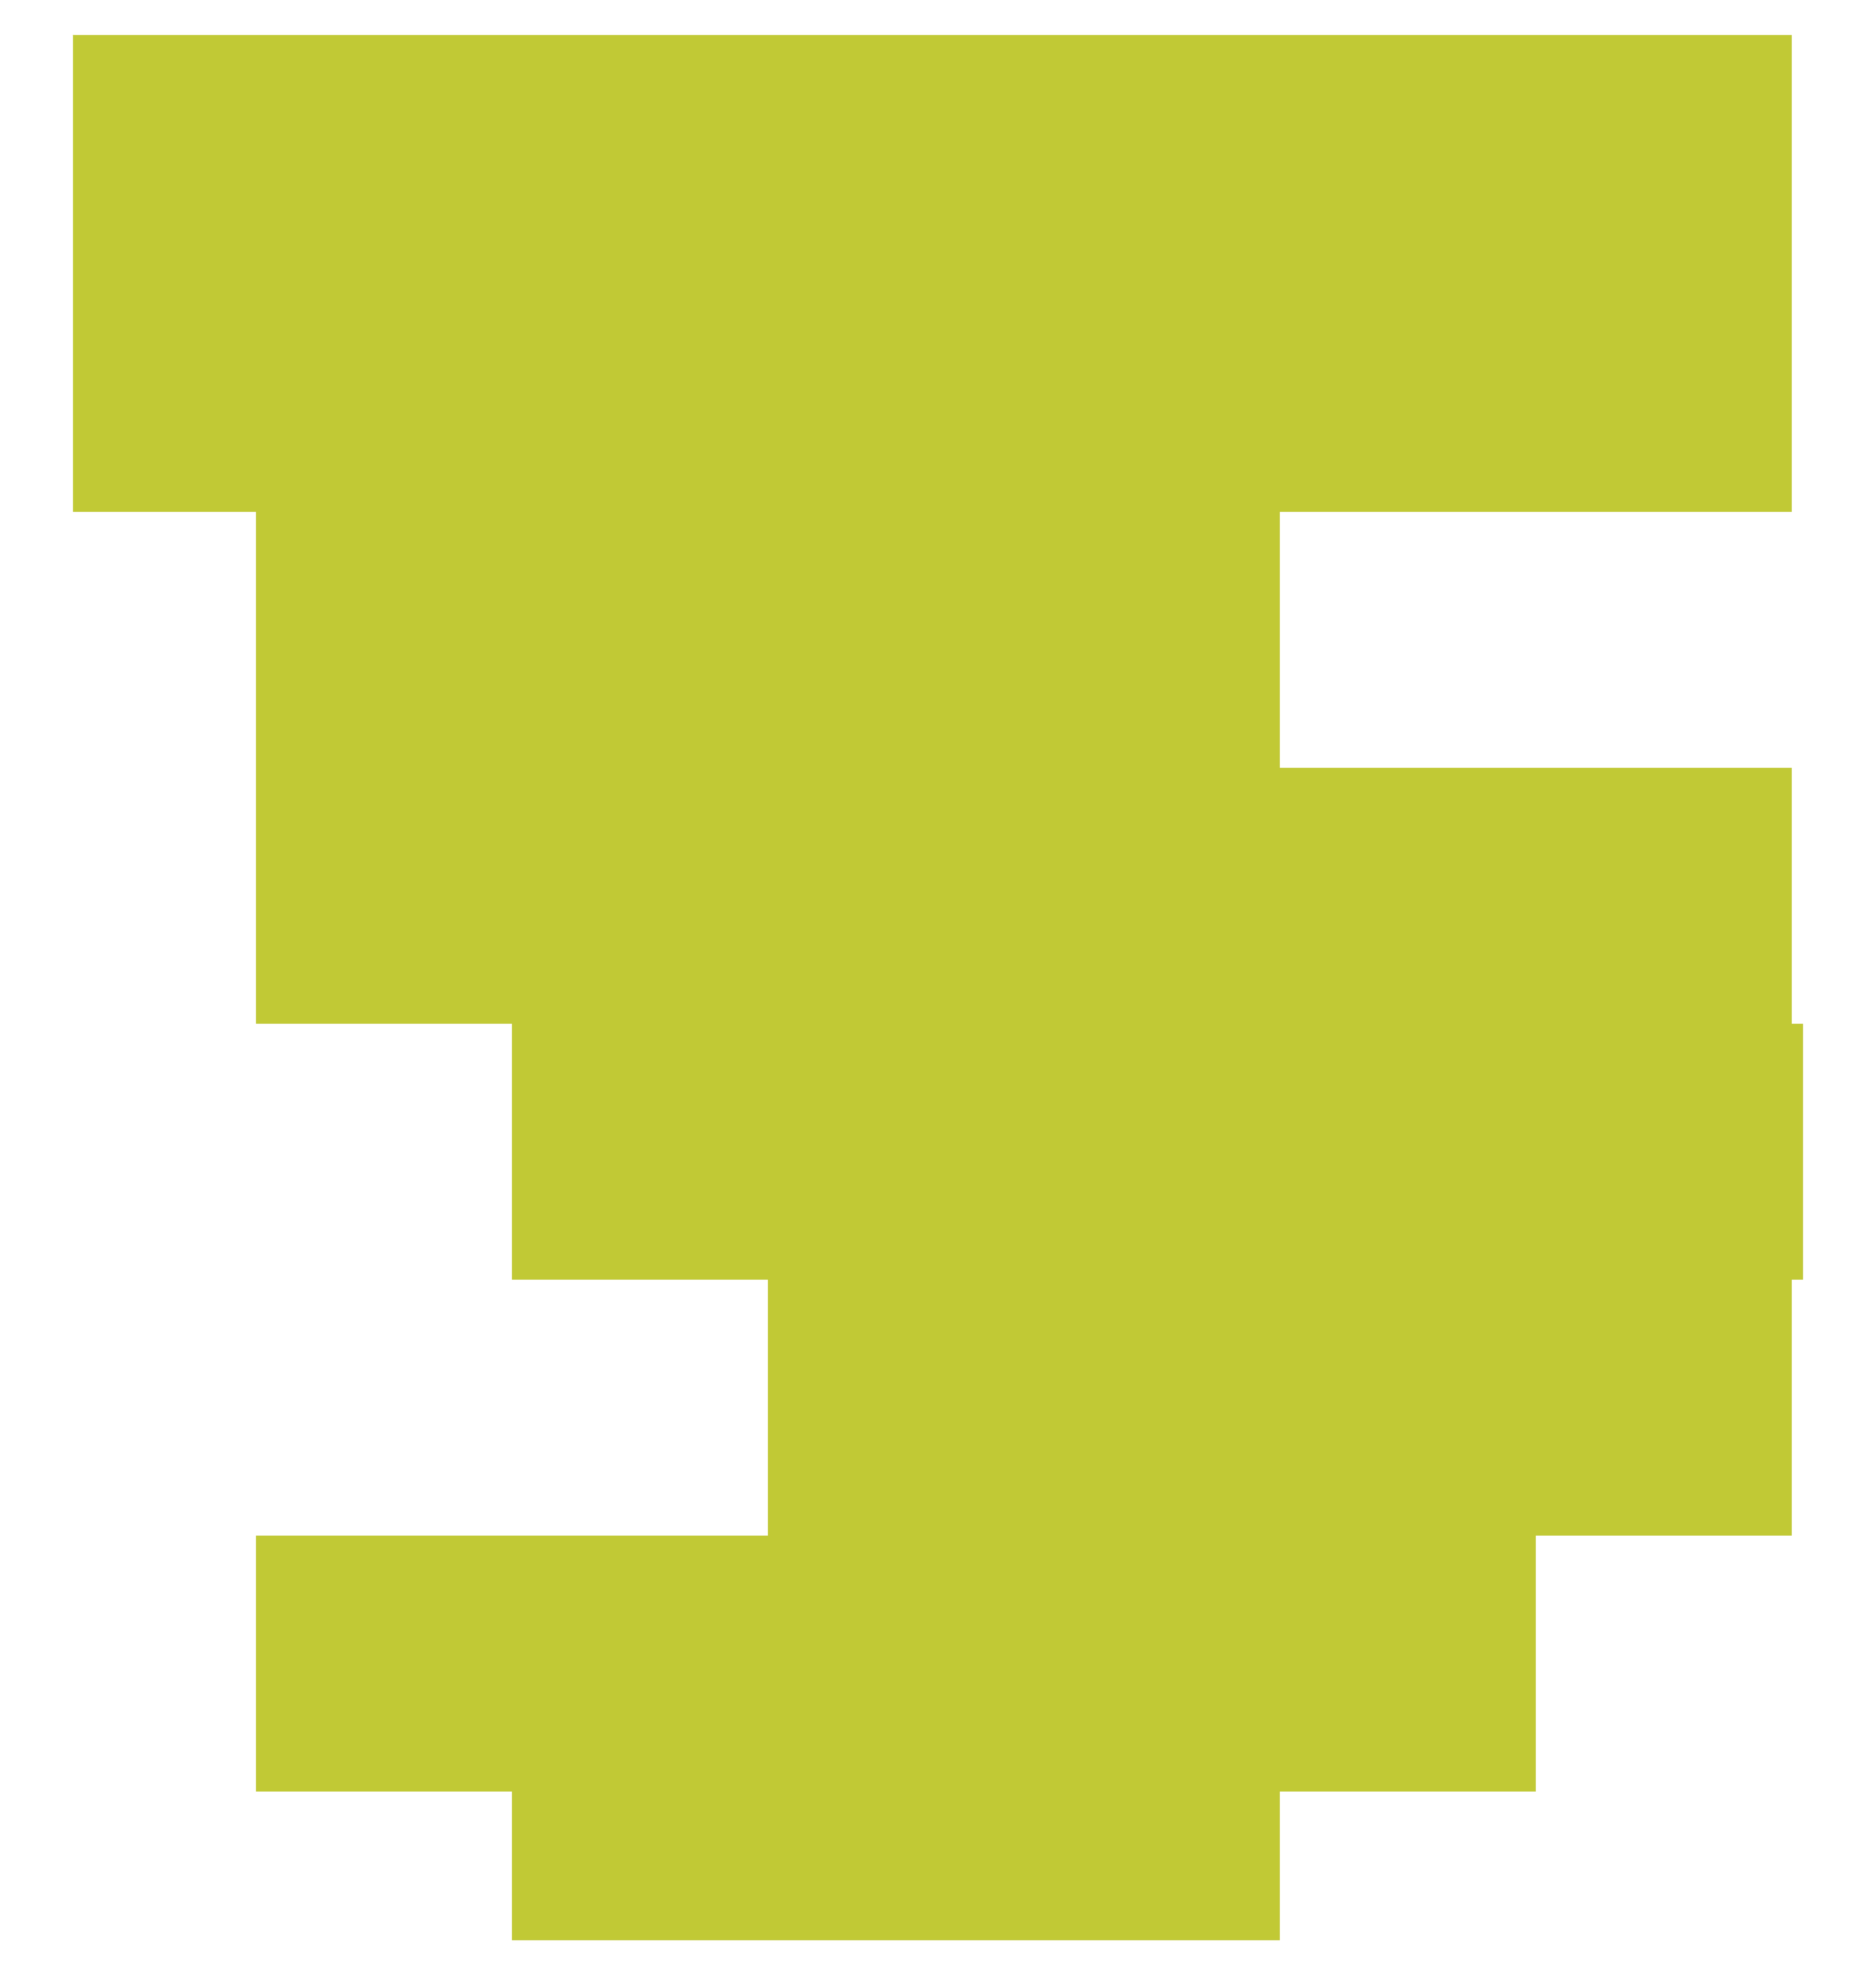 Readiness camp 2.0